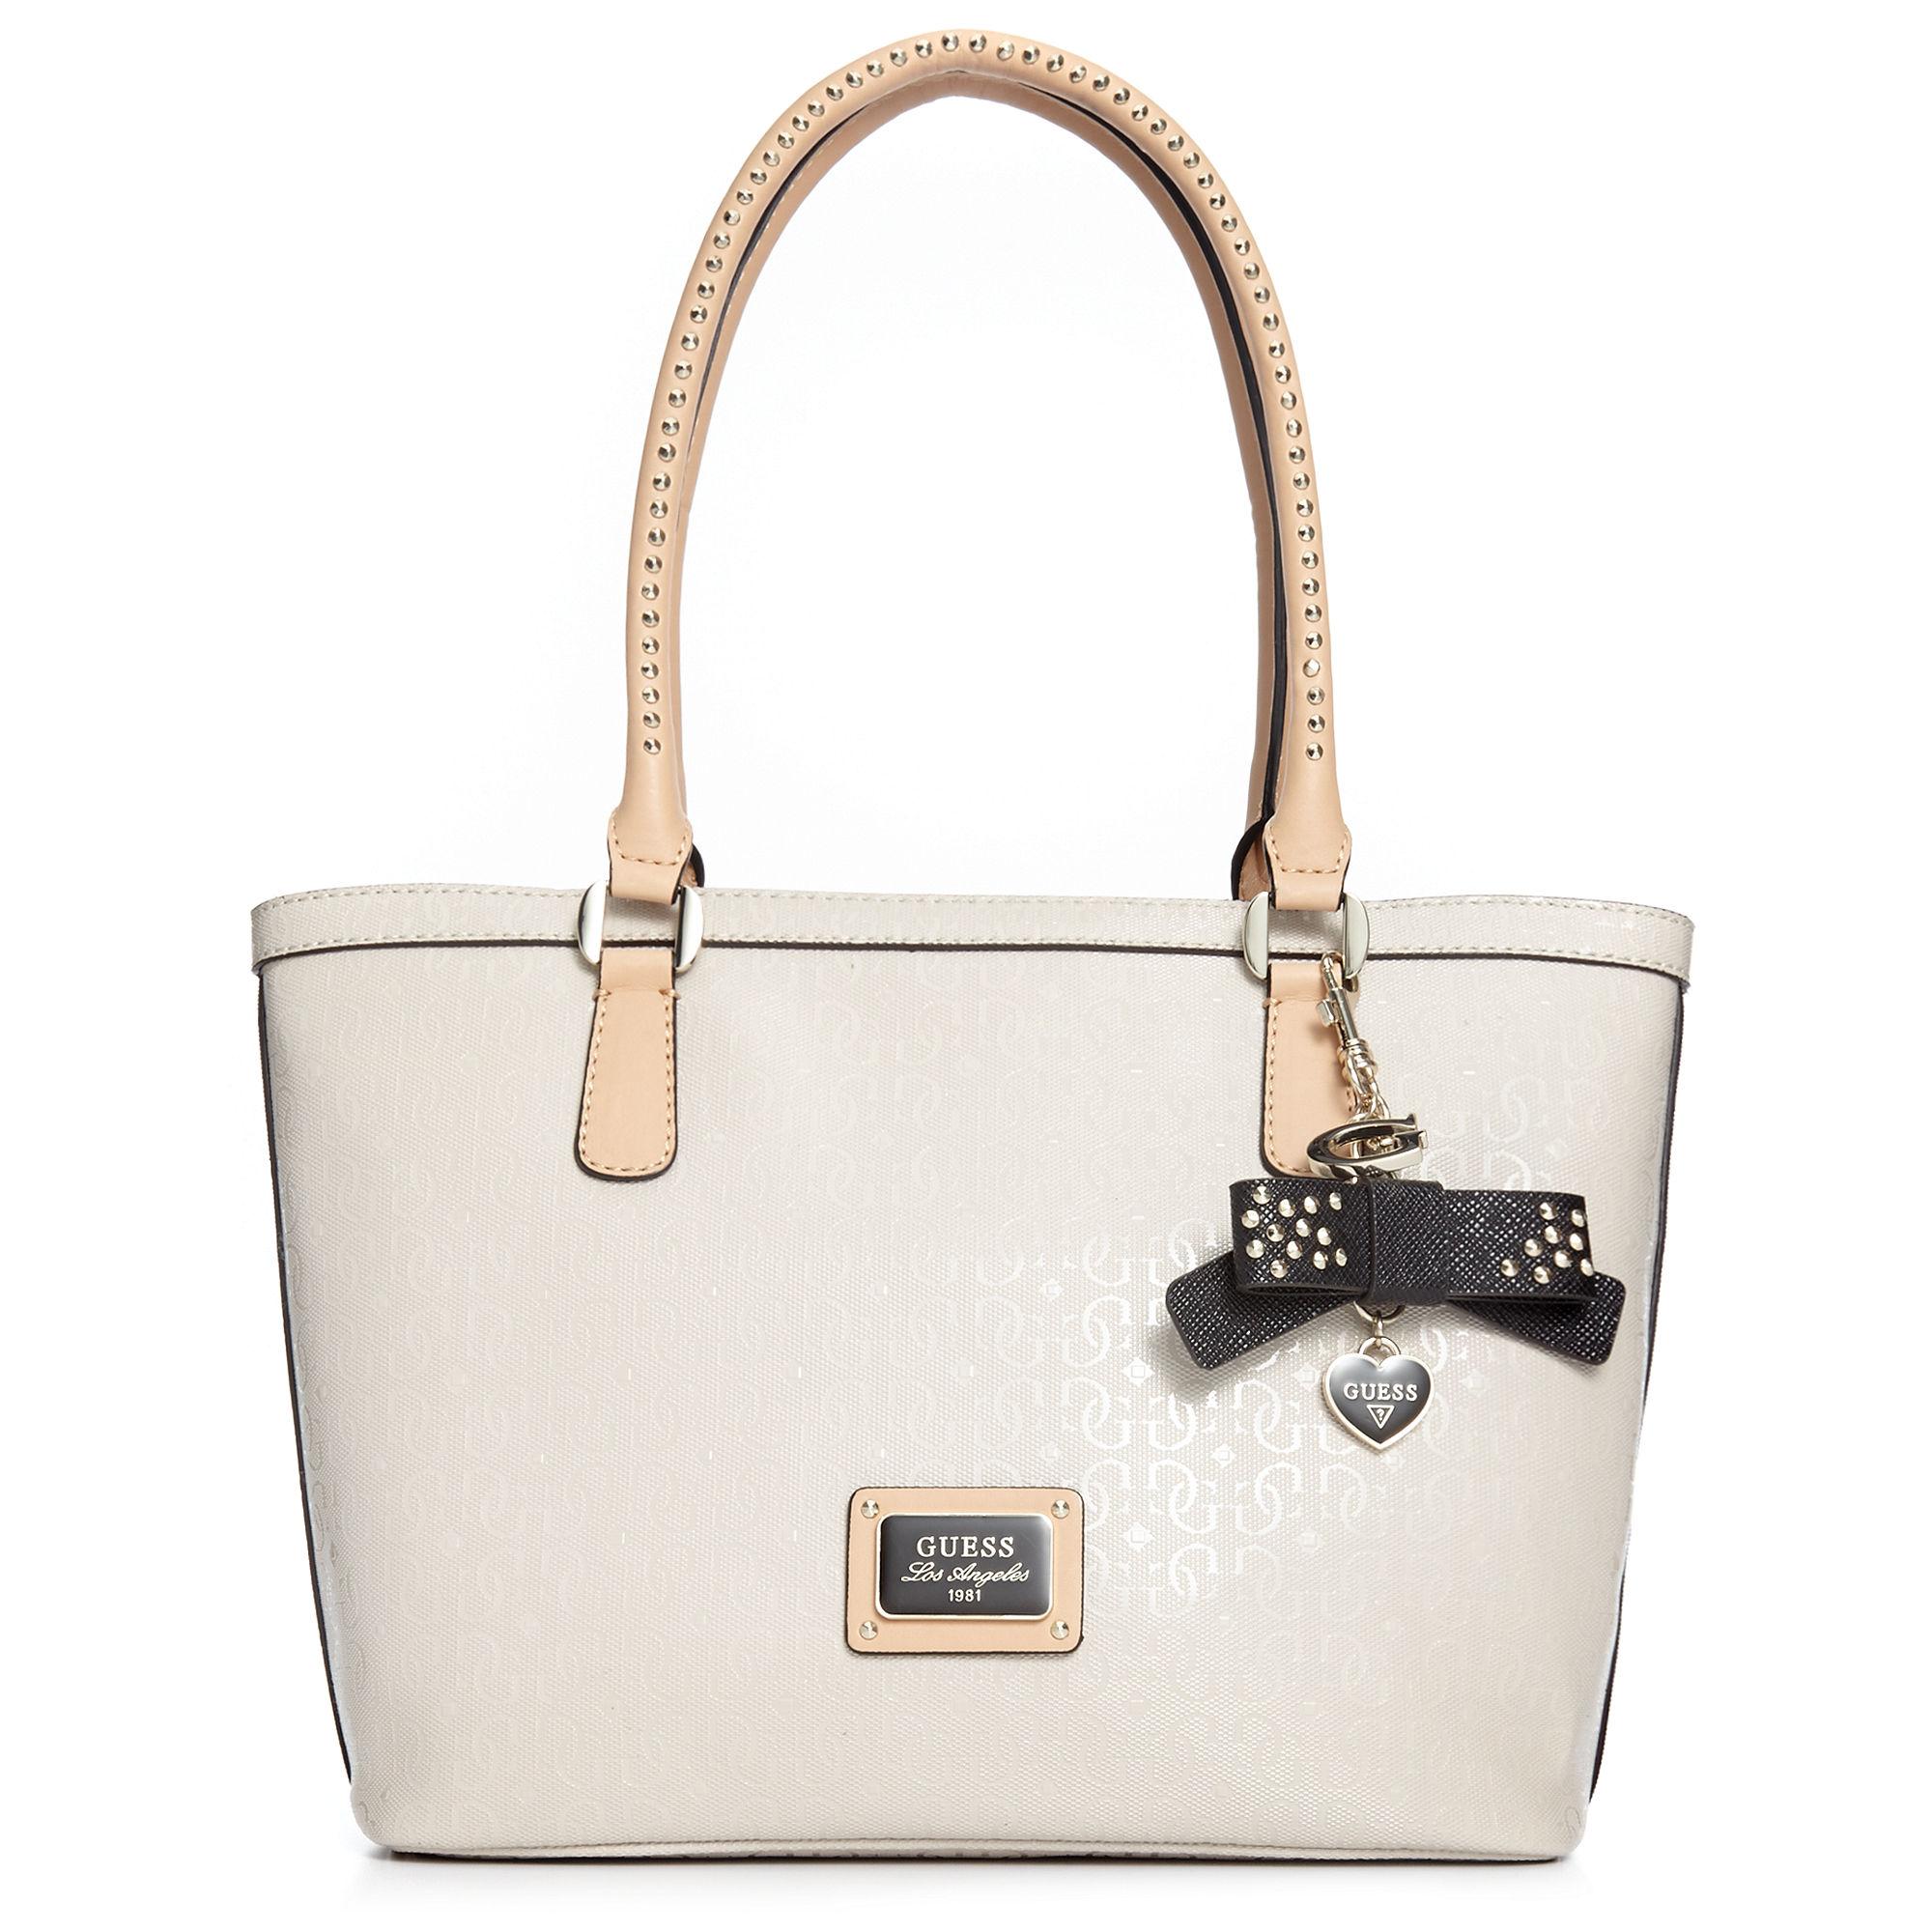 Lyst - Guess Guess Handbag Specks Small Classic